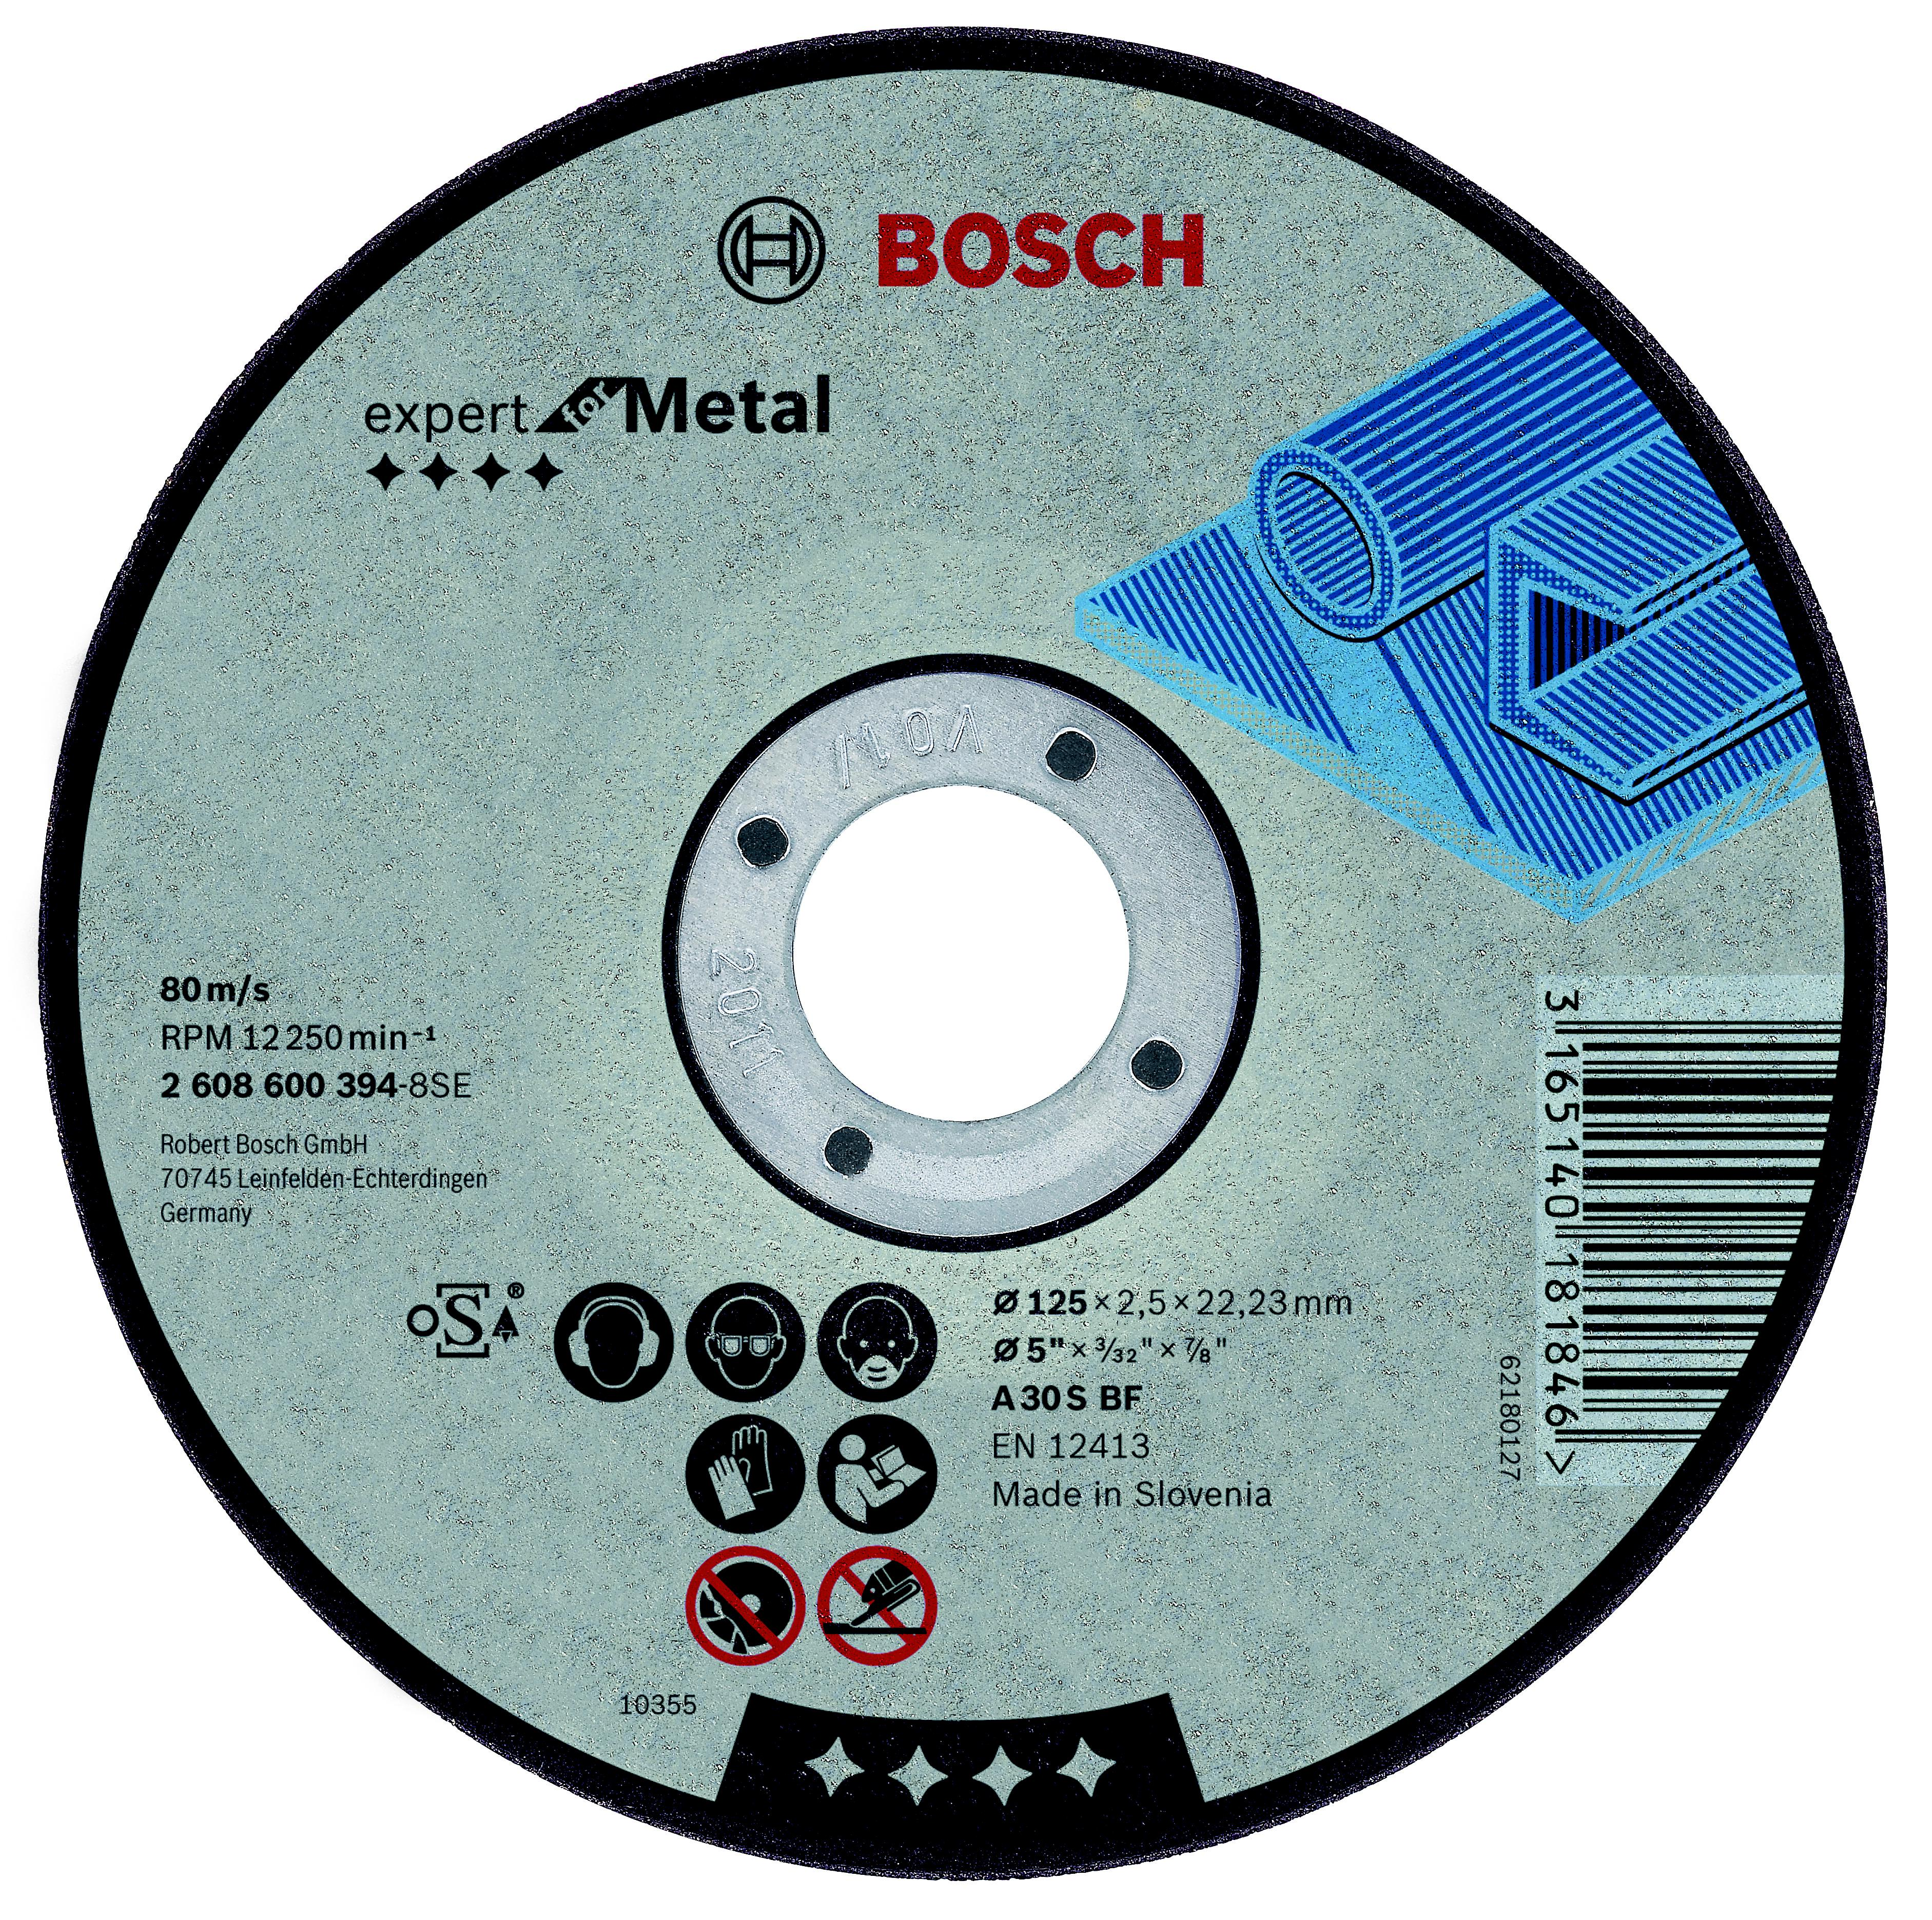 Круг отрезной Bosch 300х3.5х22 expert for metal (2.608.600.380) круг отрезной bosch expert for metal 230x1 9x22 2 608 603 400